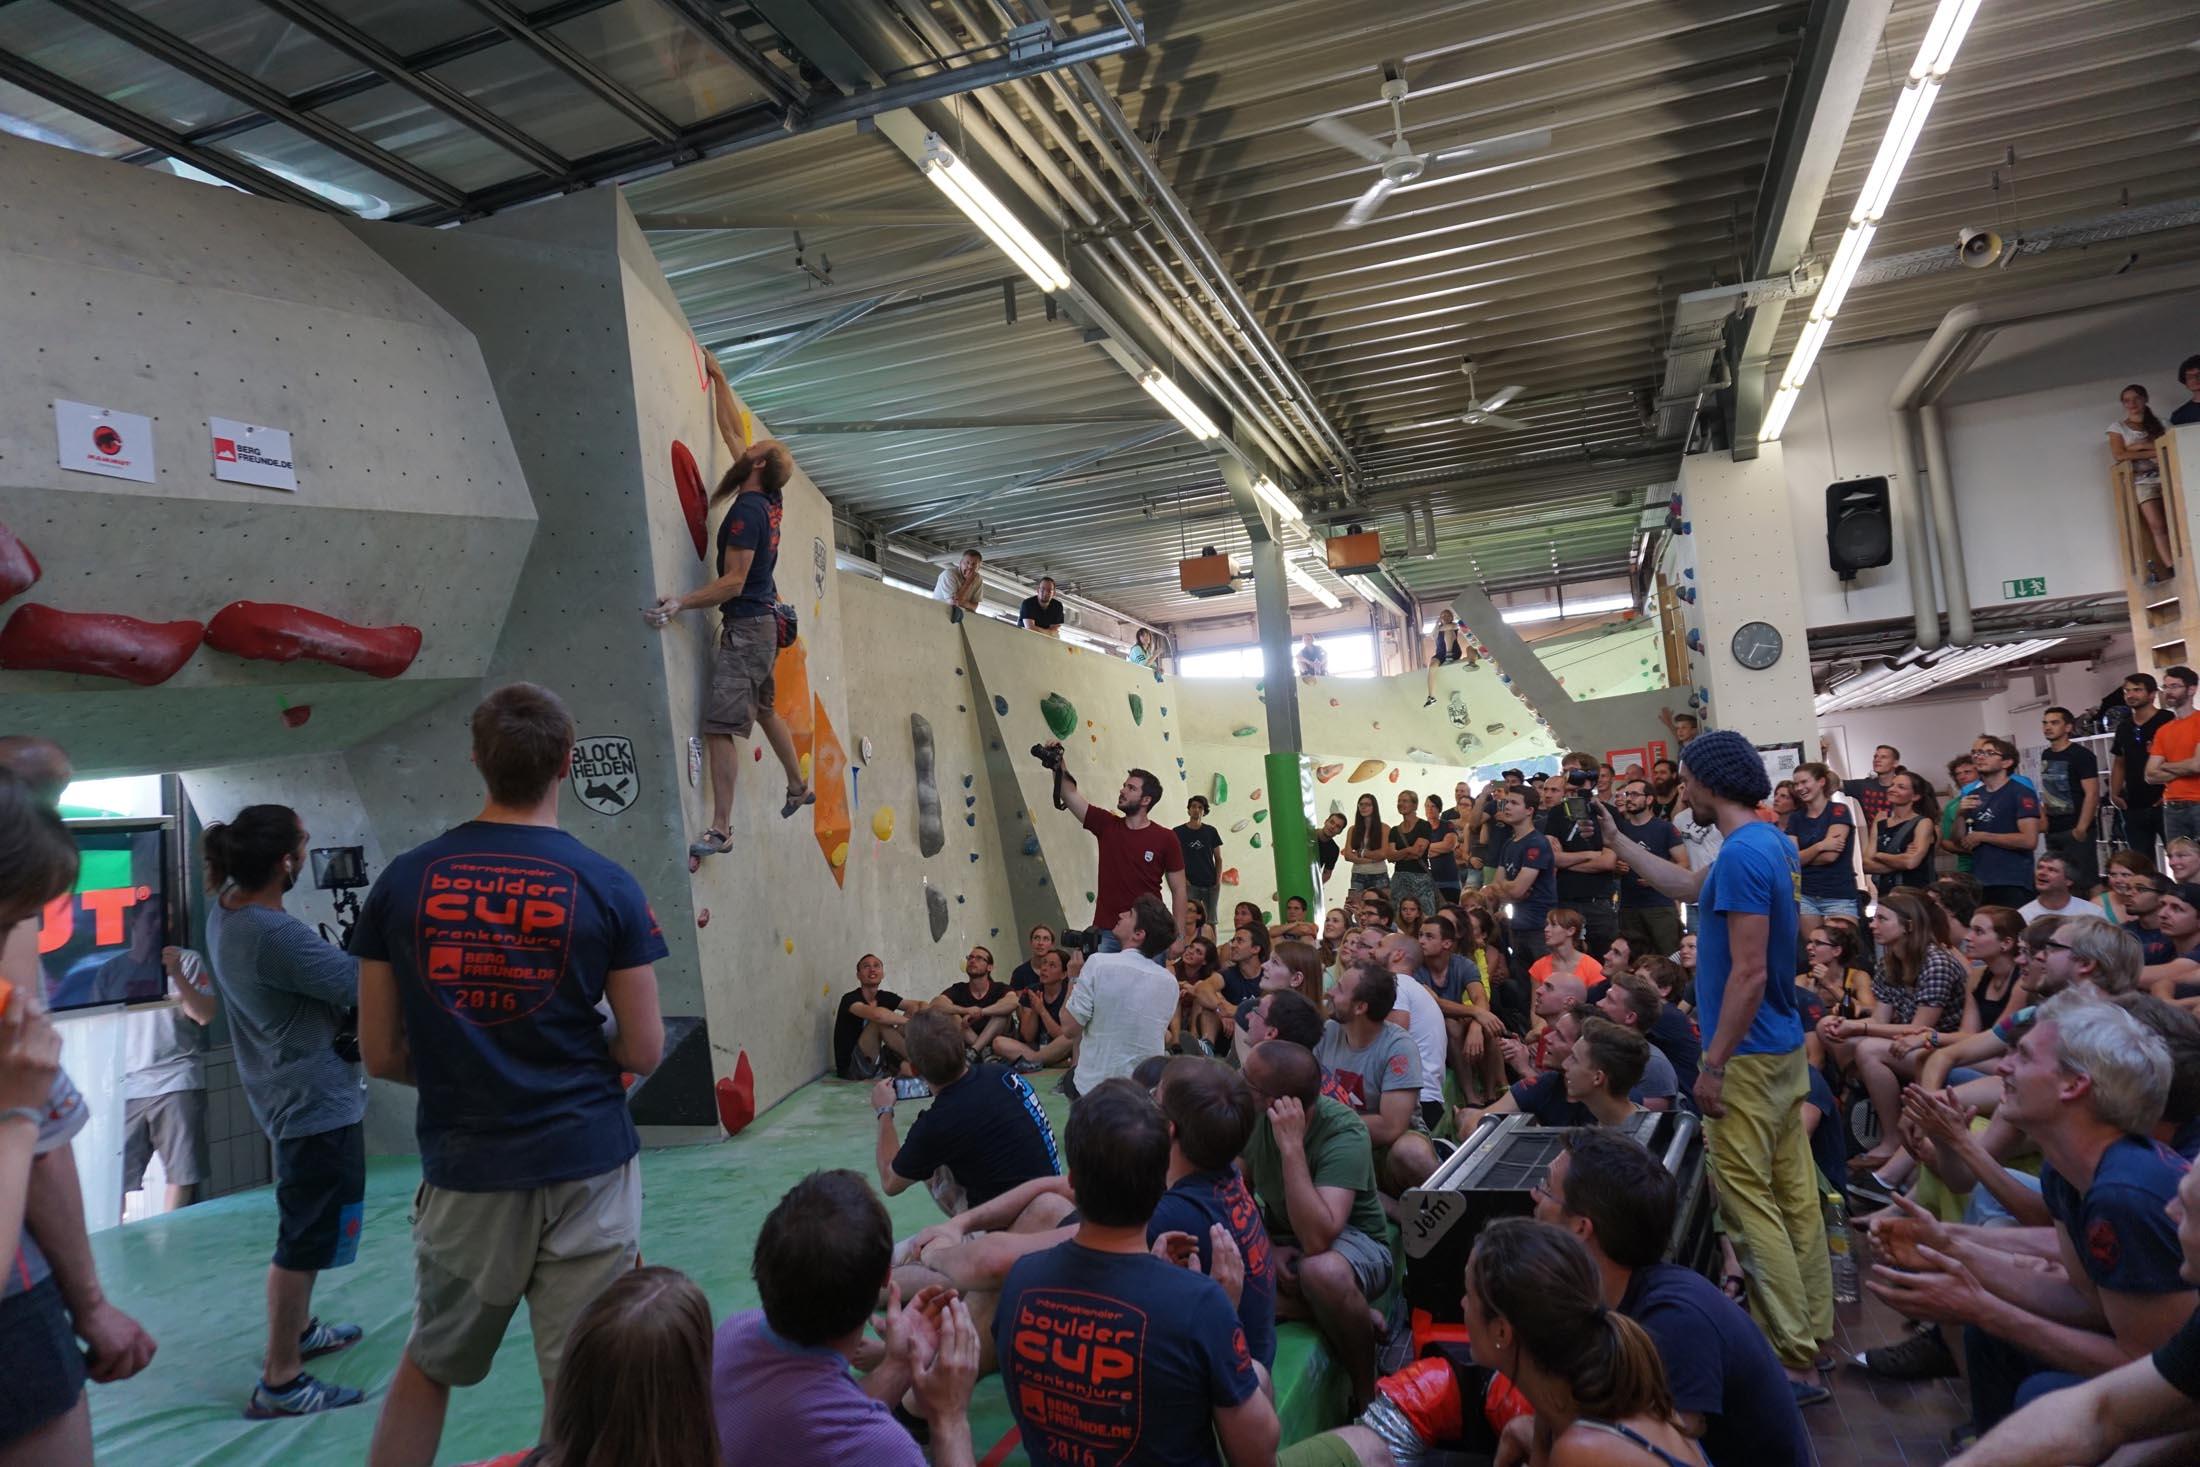 Finale, internationaler bouldercup Frankenjura 2016, BLOCKHELDEN Erlangen, Mammut, Bergfreunde.de, Boulderwettkampf07092016600